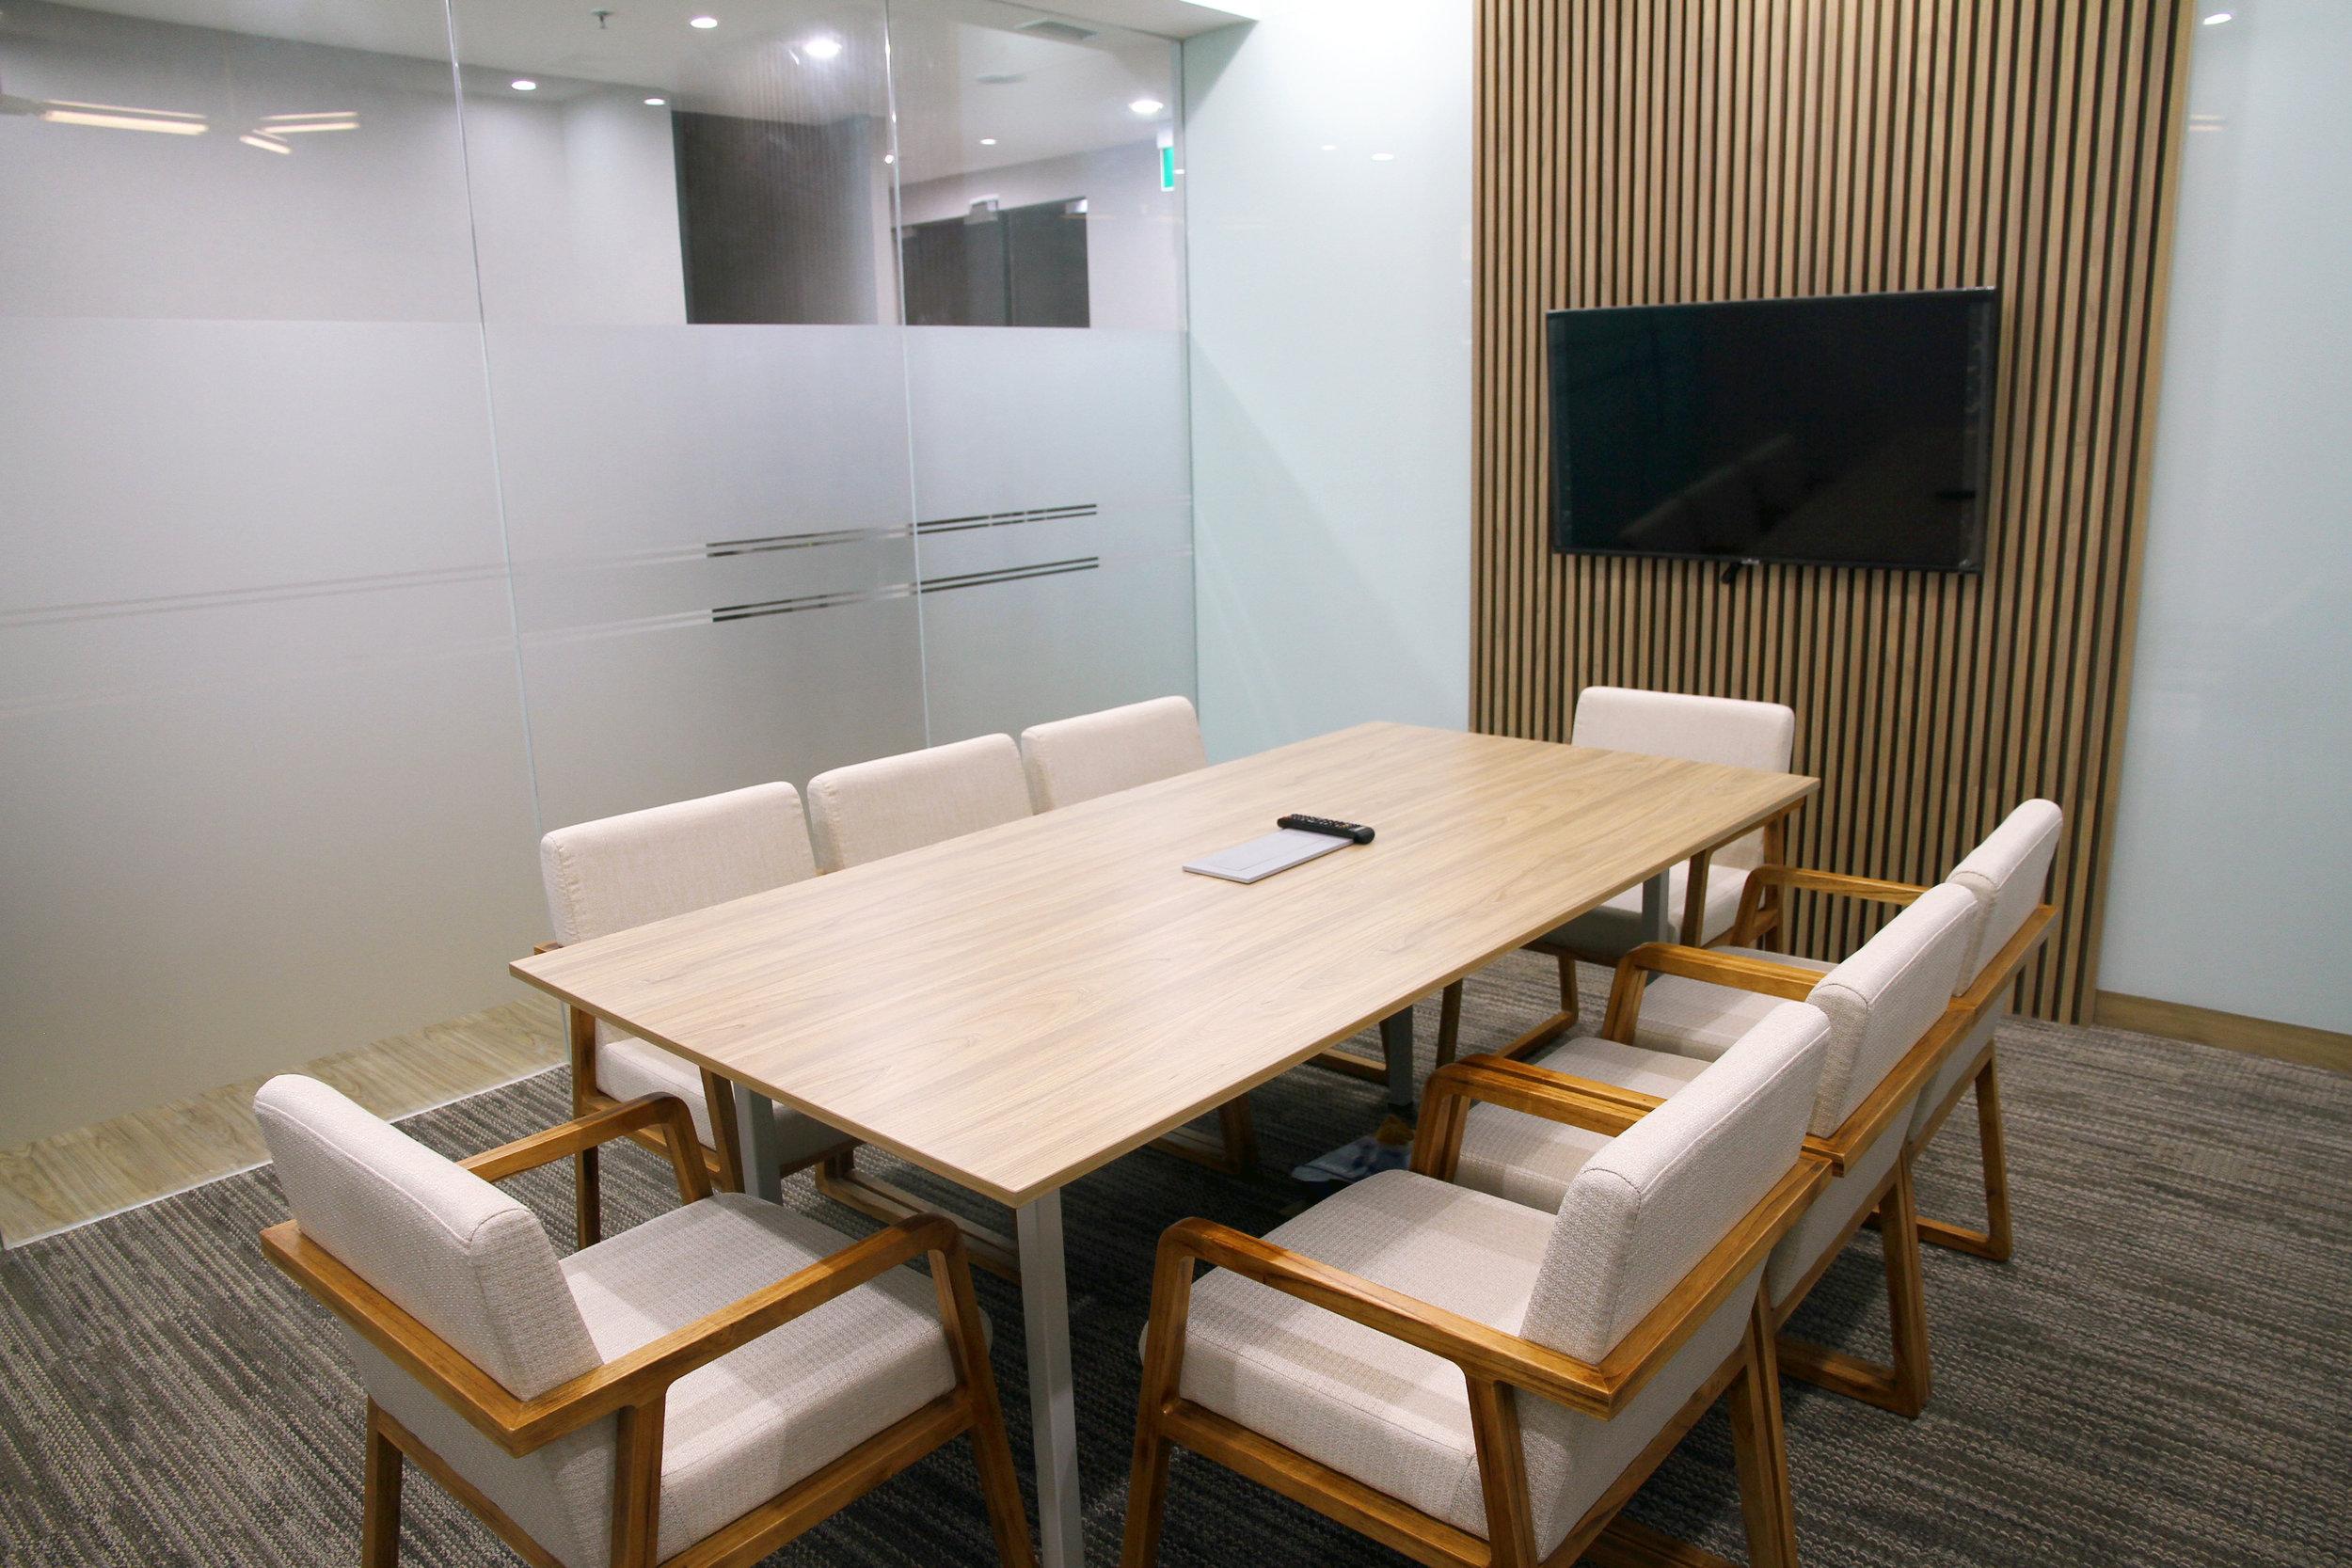 avenue8 meeting room